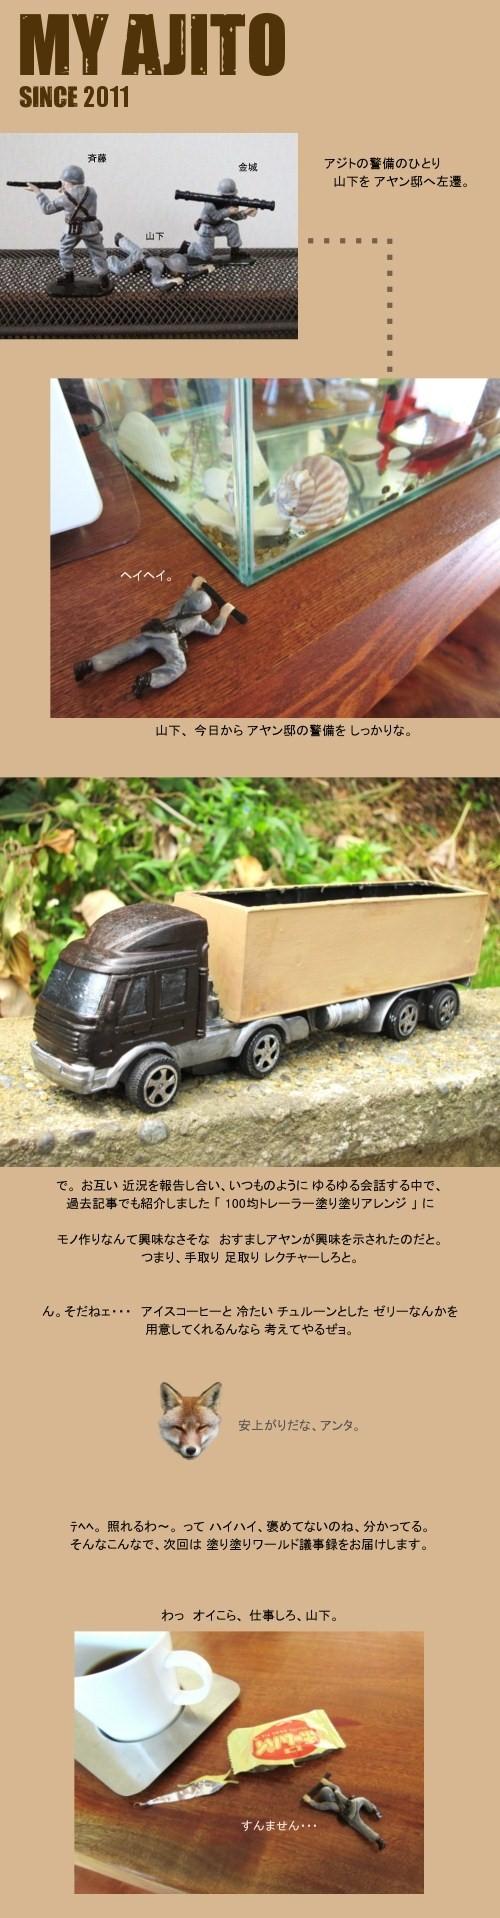 tsuke_06.jpg